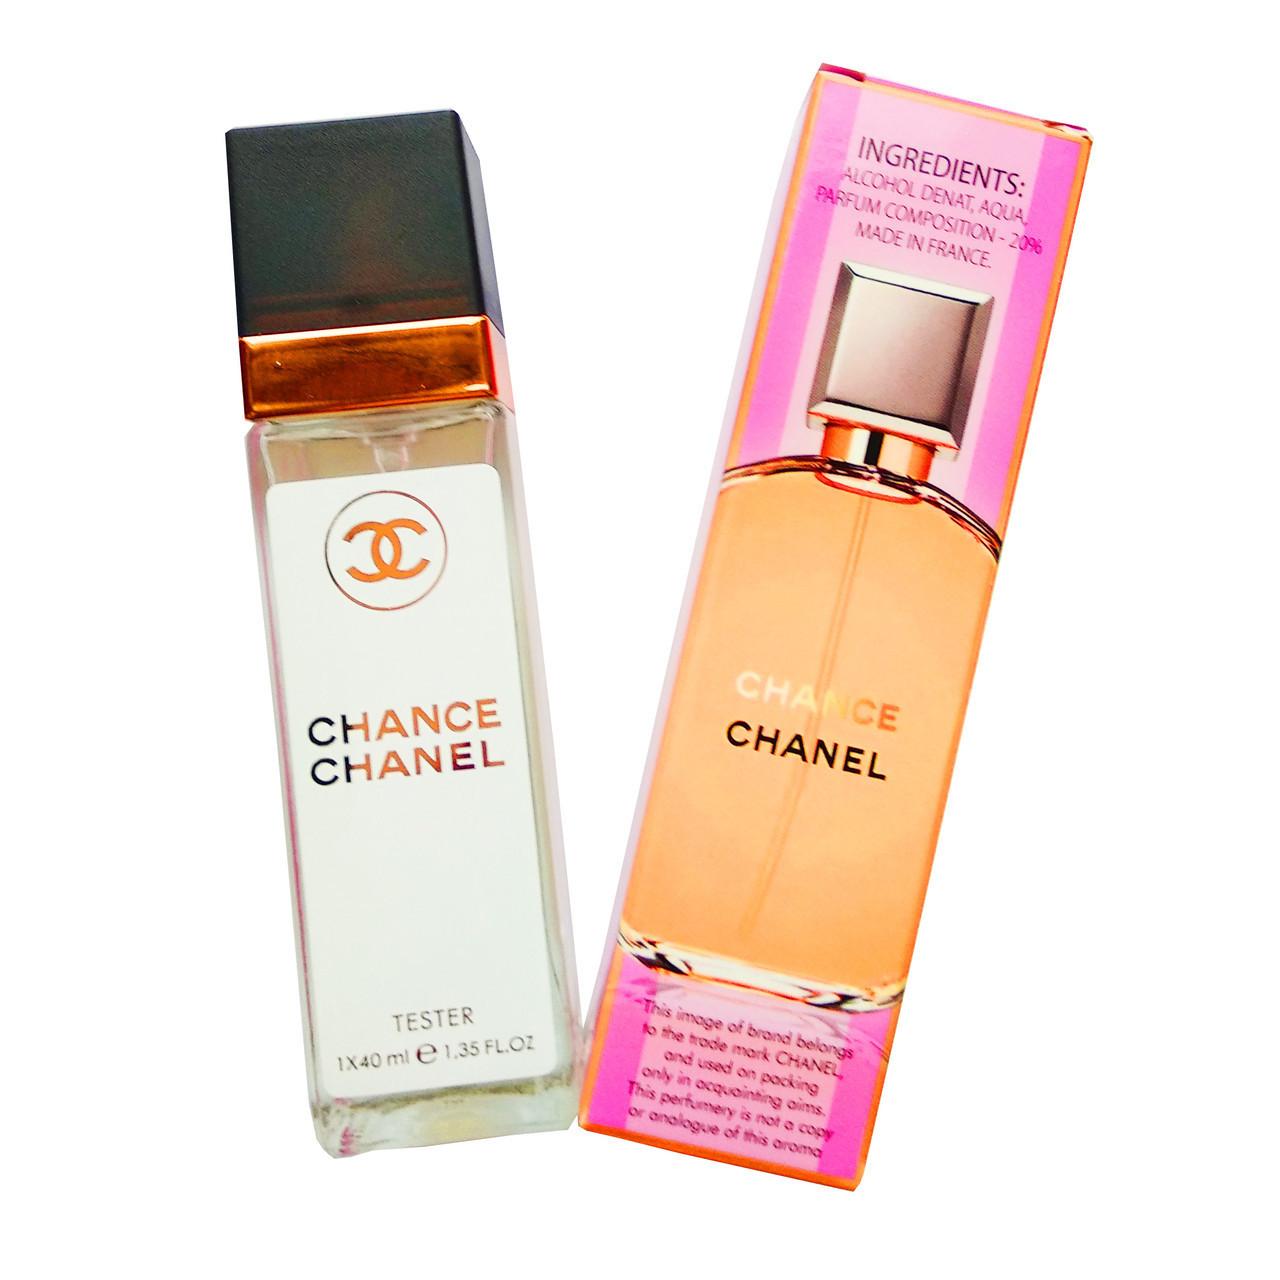 Міні парфуми тестер CHANCE PARFUM (ШАНЕЛ ШАНС ПАРФУМ) 40МЛ (РЕПЛІКА)